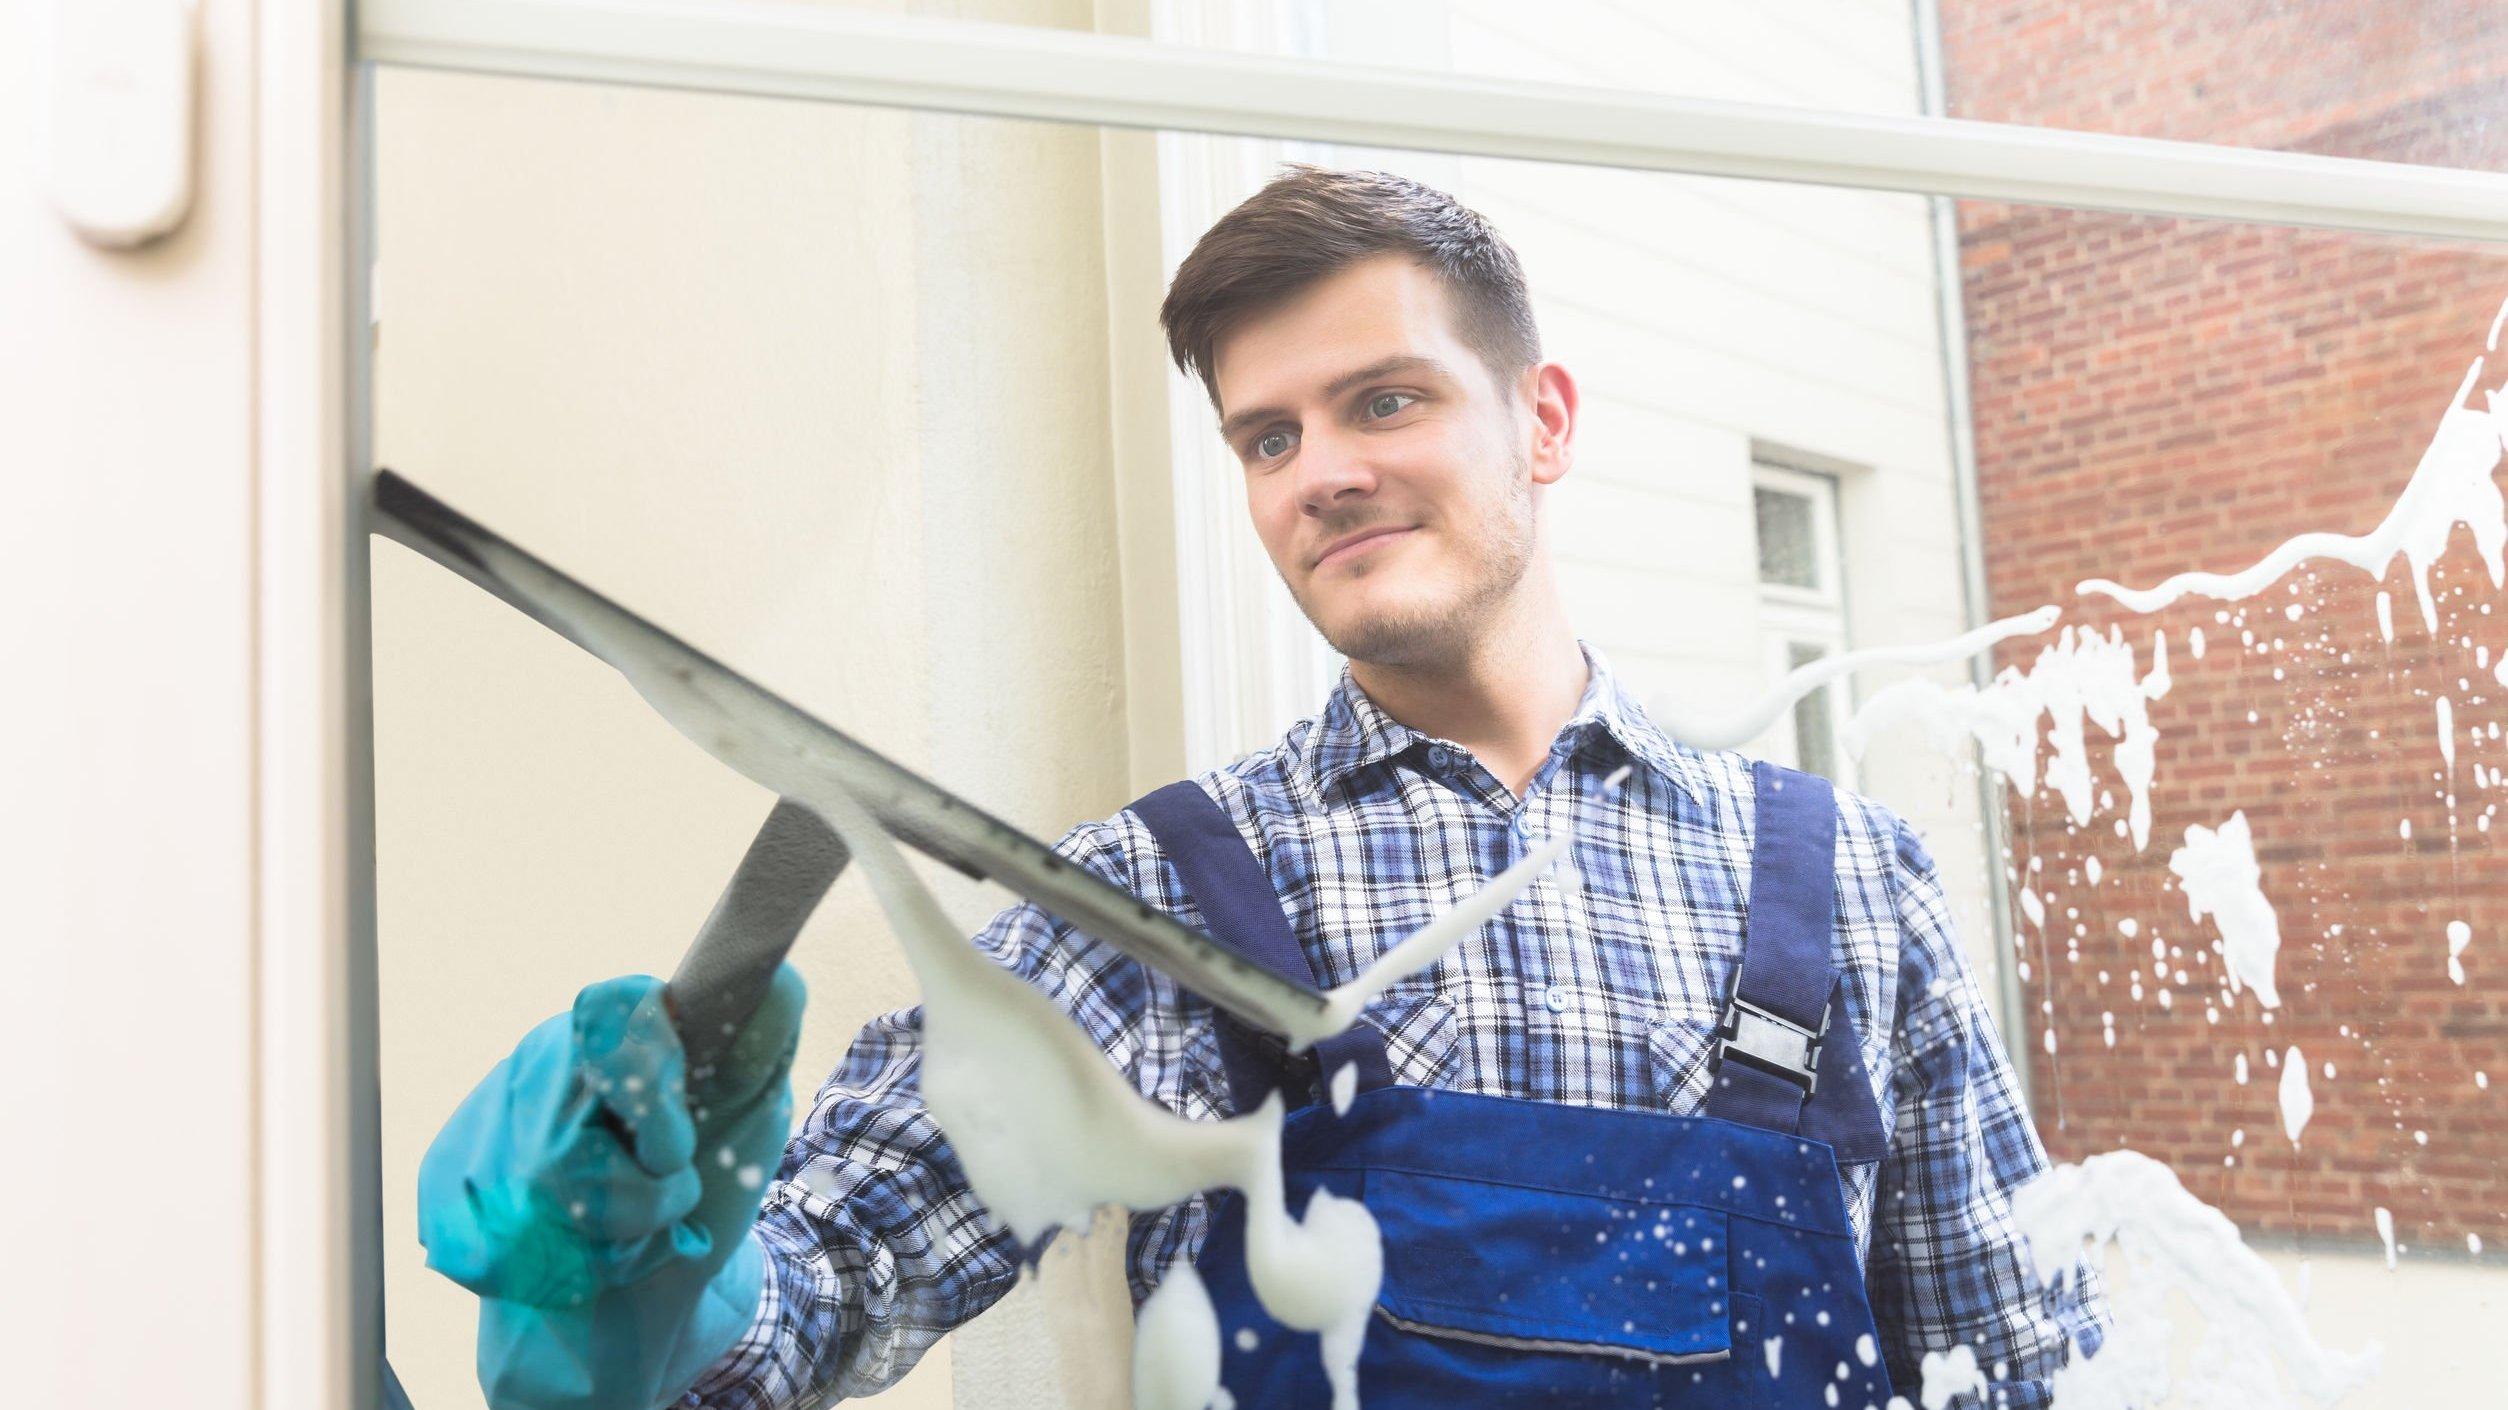 Foto de zelador limpando vidro